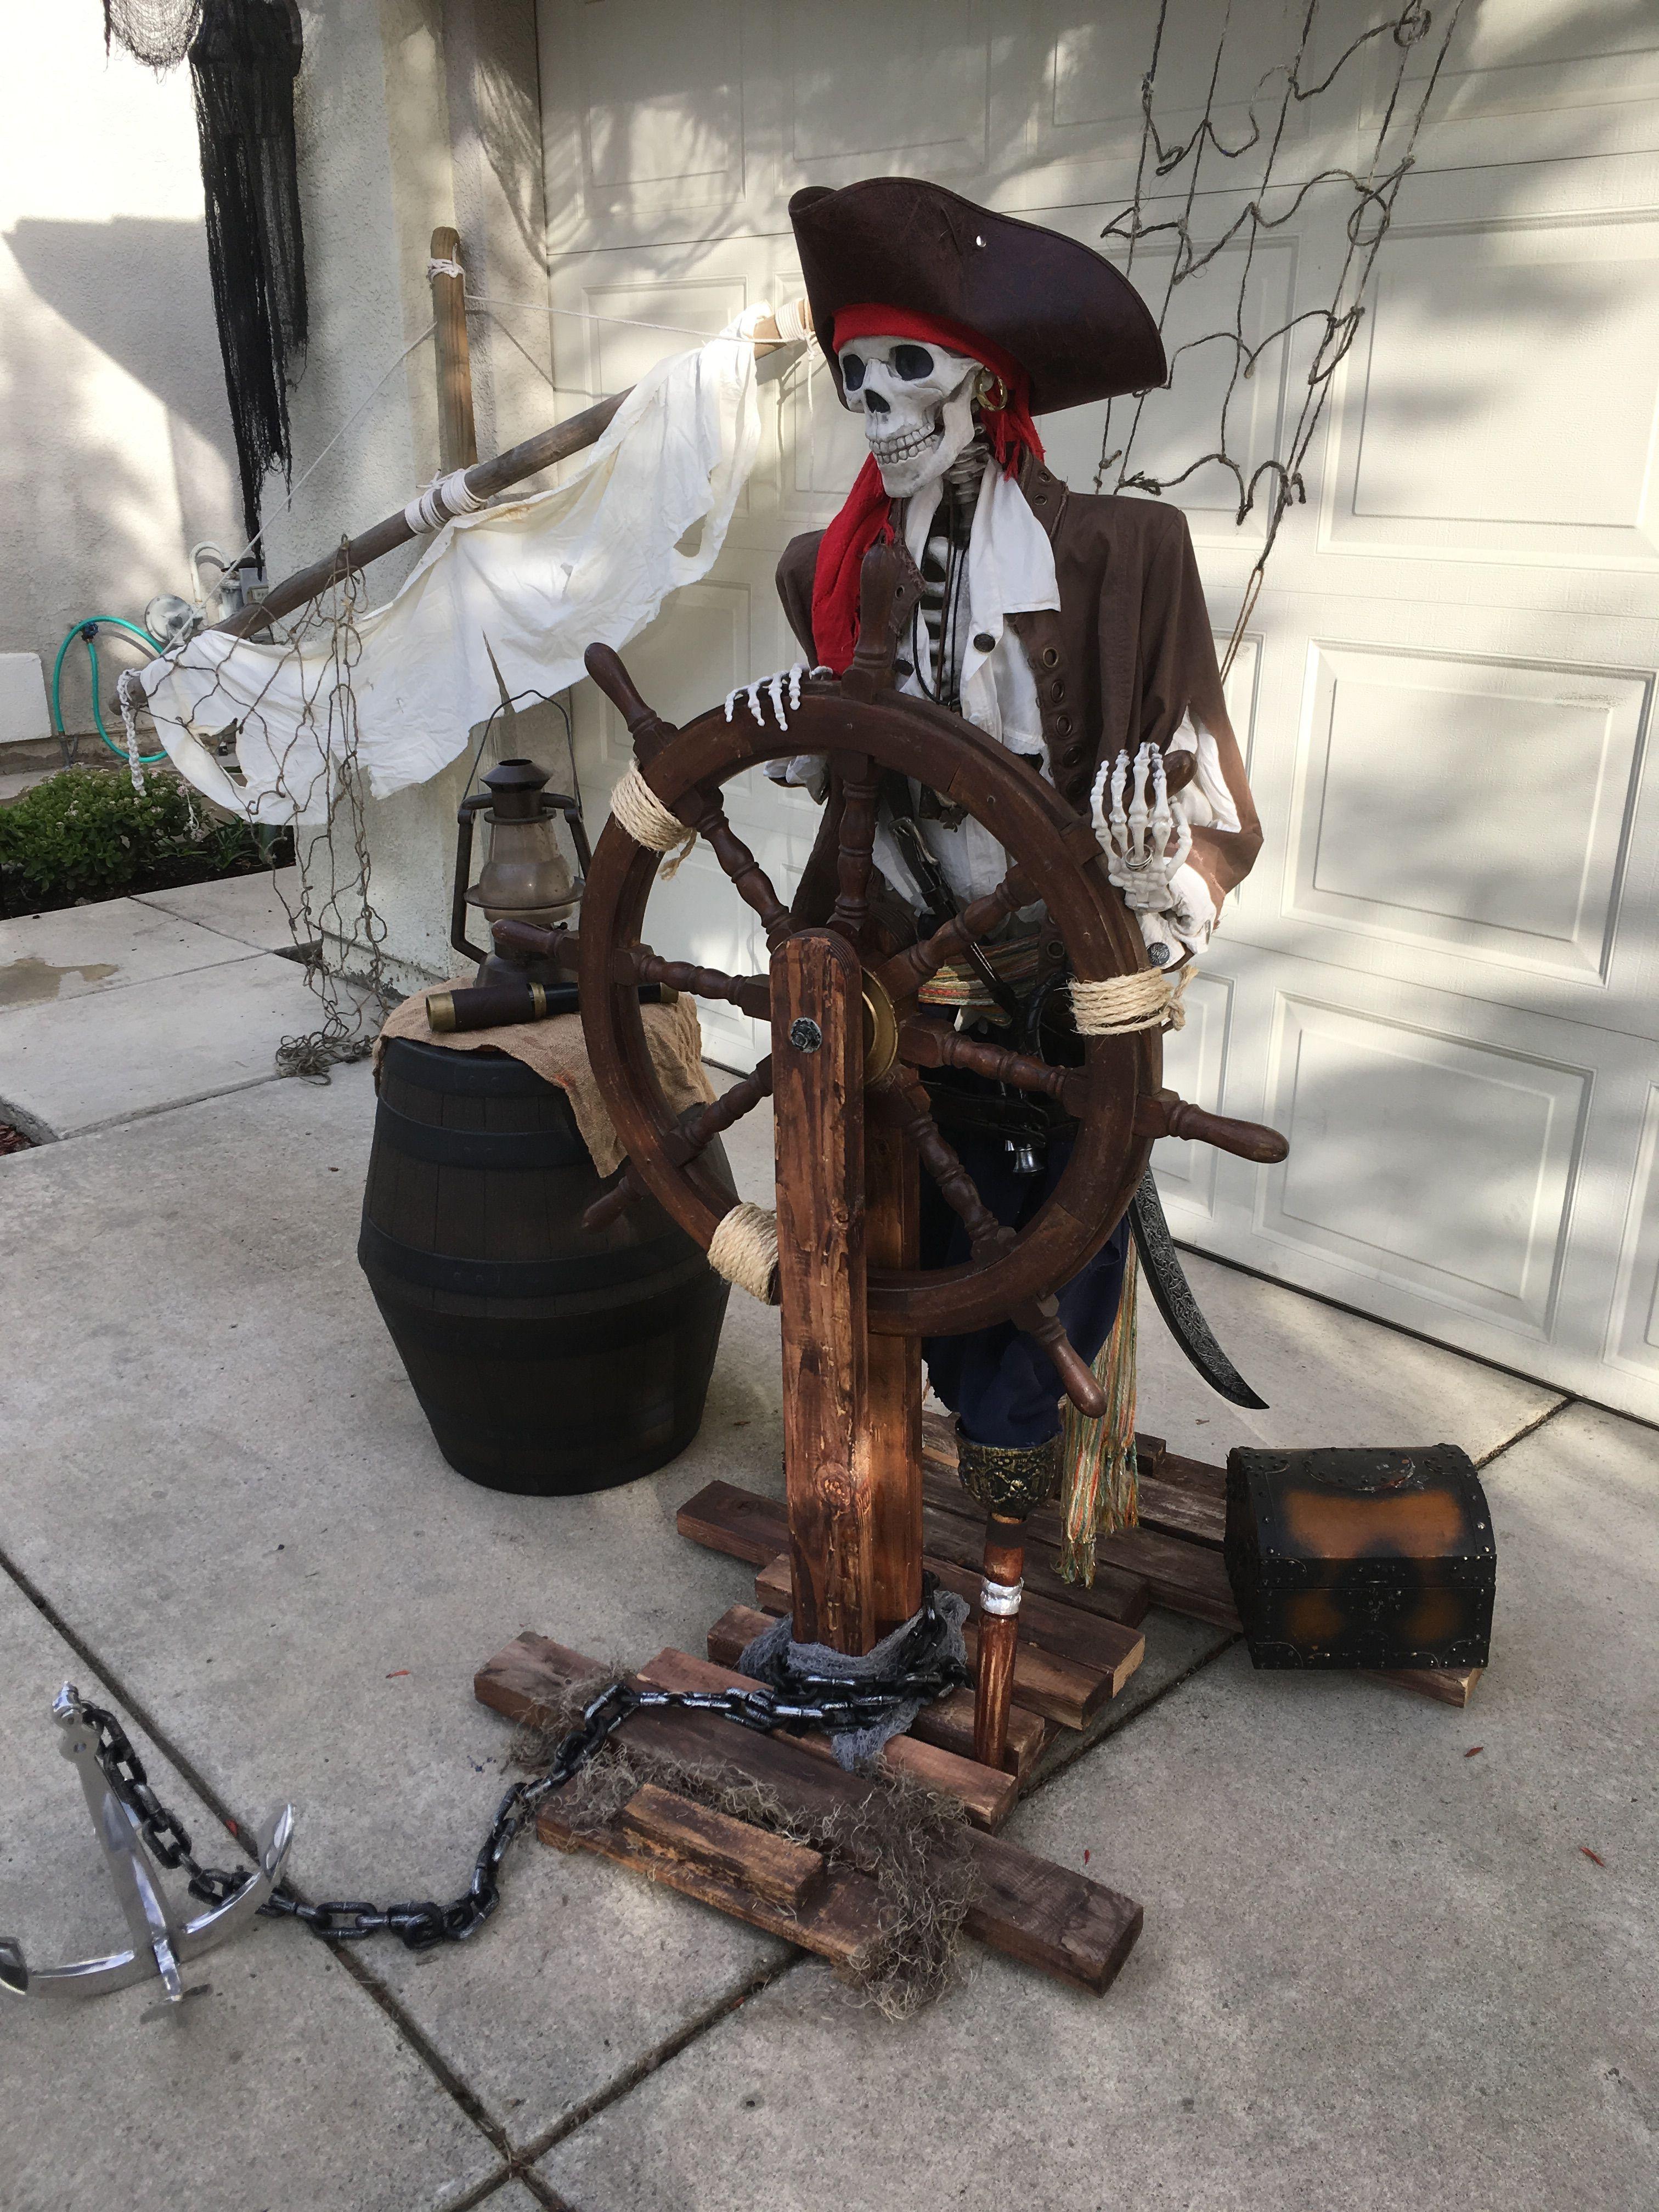 31 pirate halloween decorations in 2020 pirate halloween